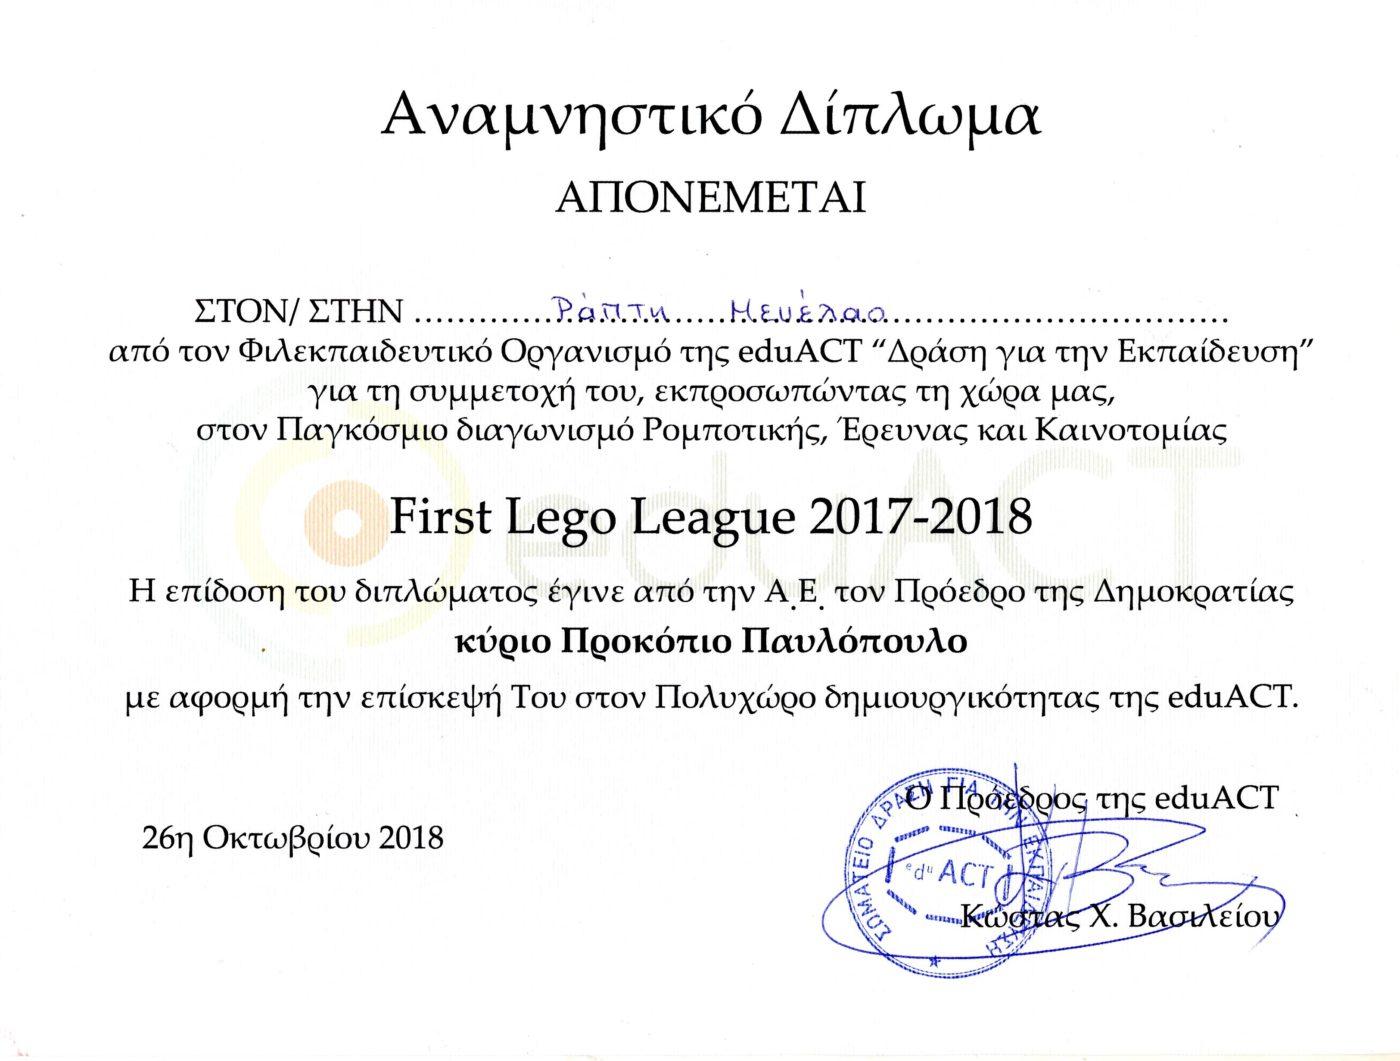 10-26 Fritst Lego League Ράπτης Γ-Λ